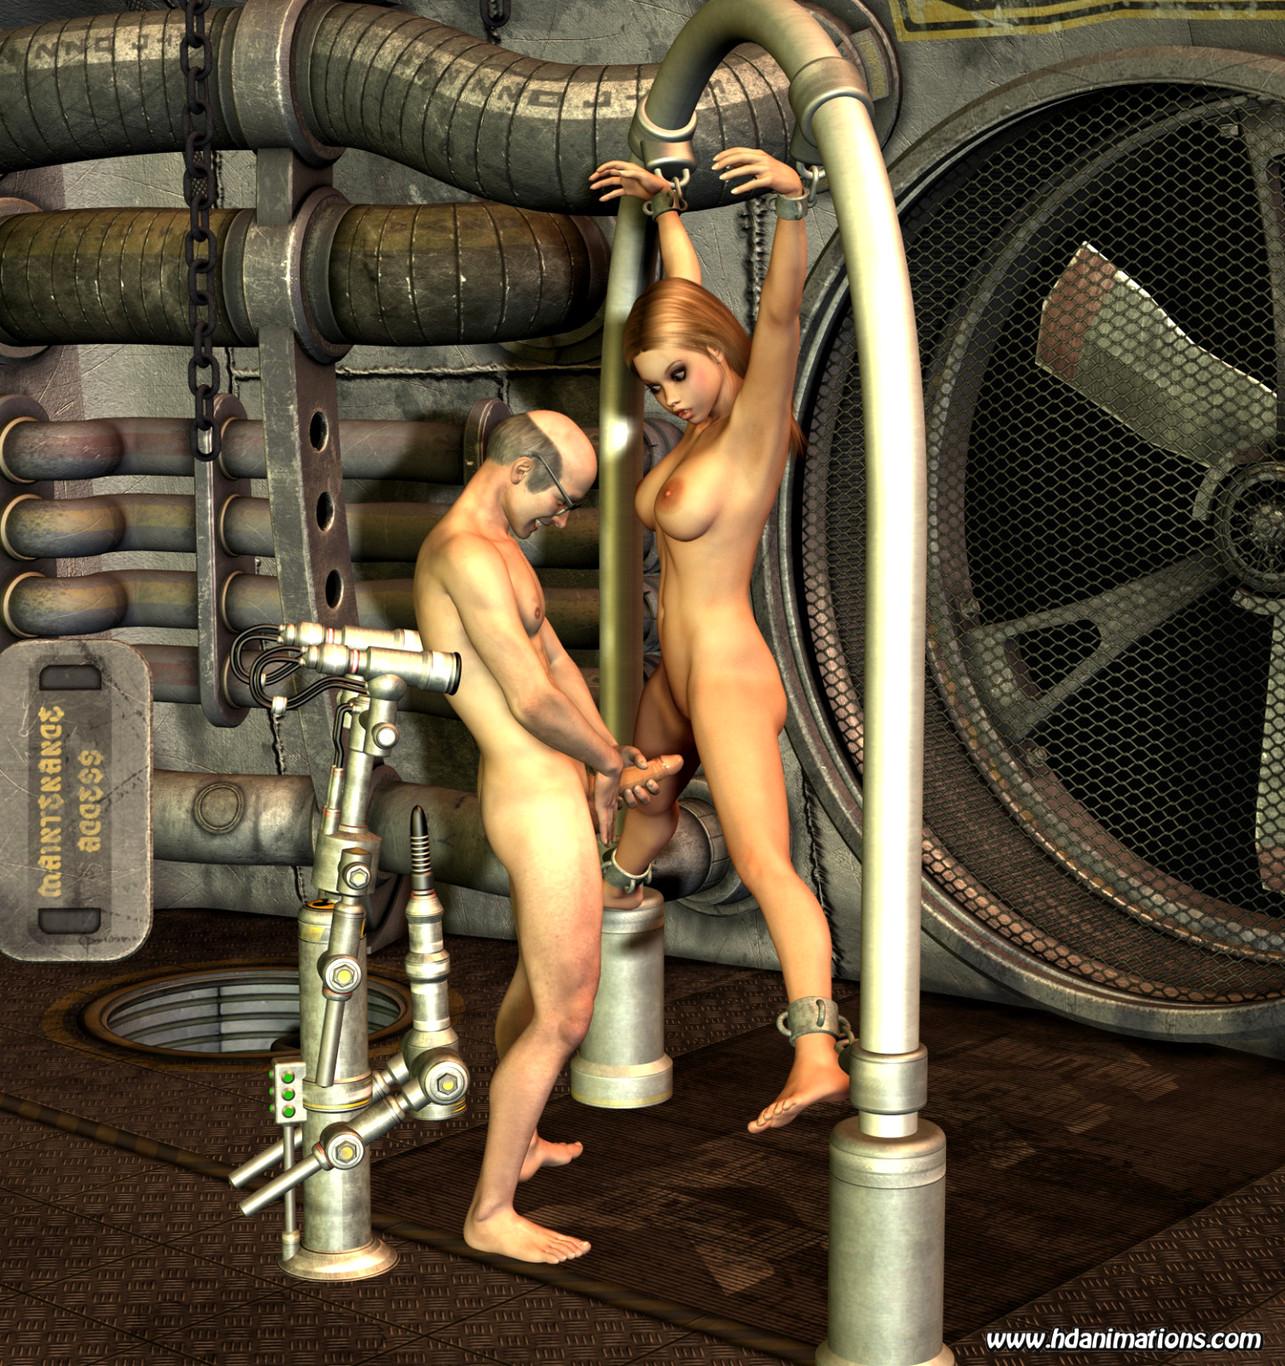 igrat-igri-pro-seks-roboti